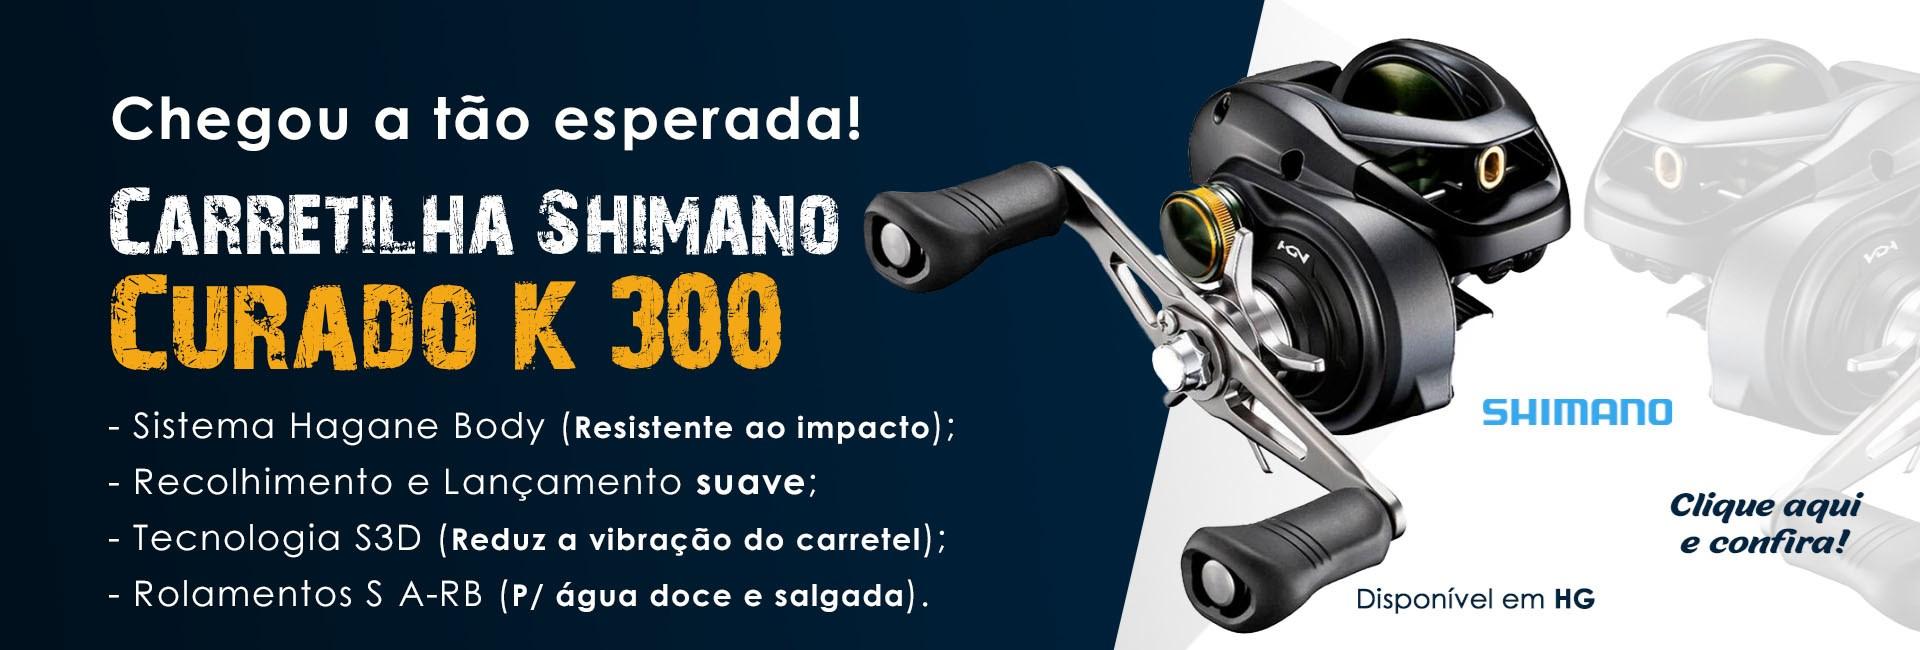 Carretilha SHIMANO Curado 300